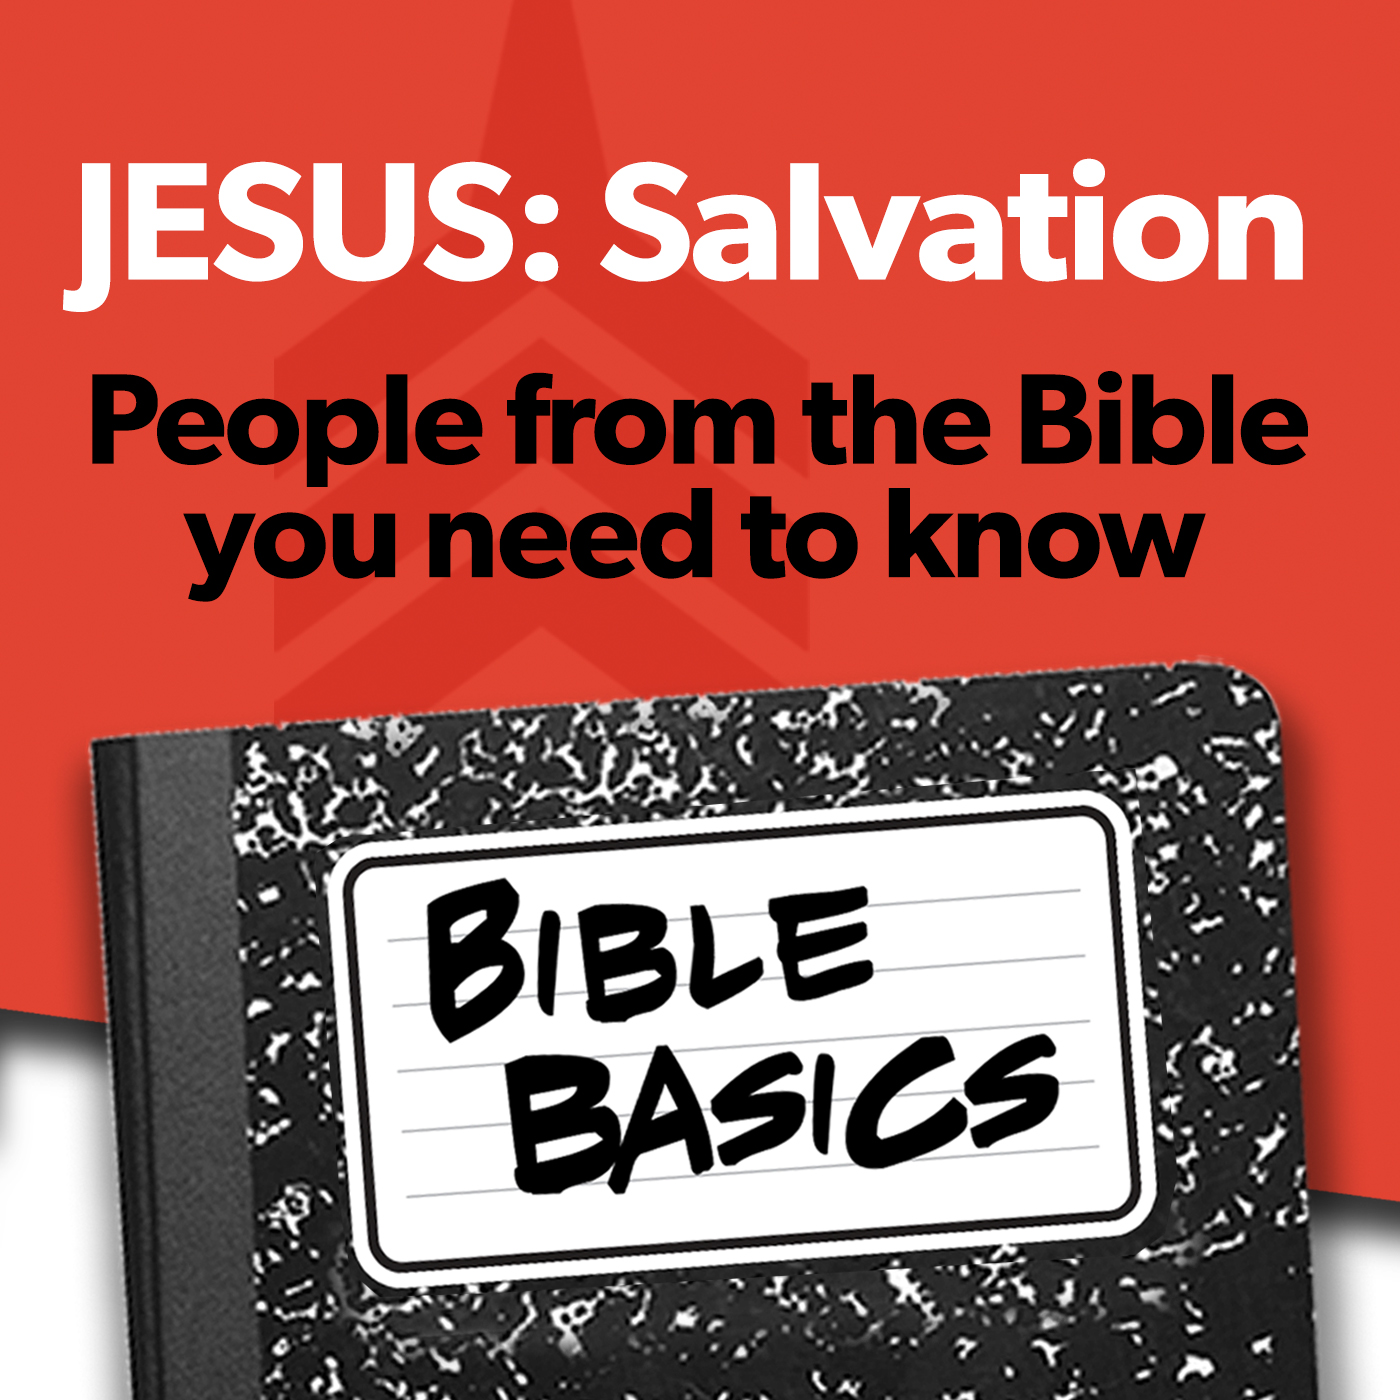 JESUS SALVATION Basics.jpg